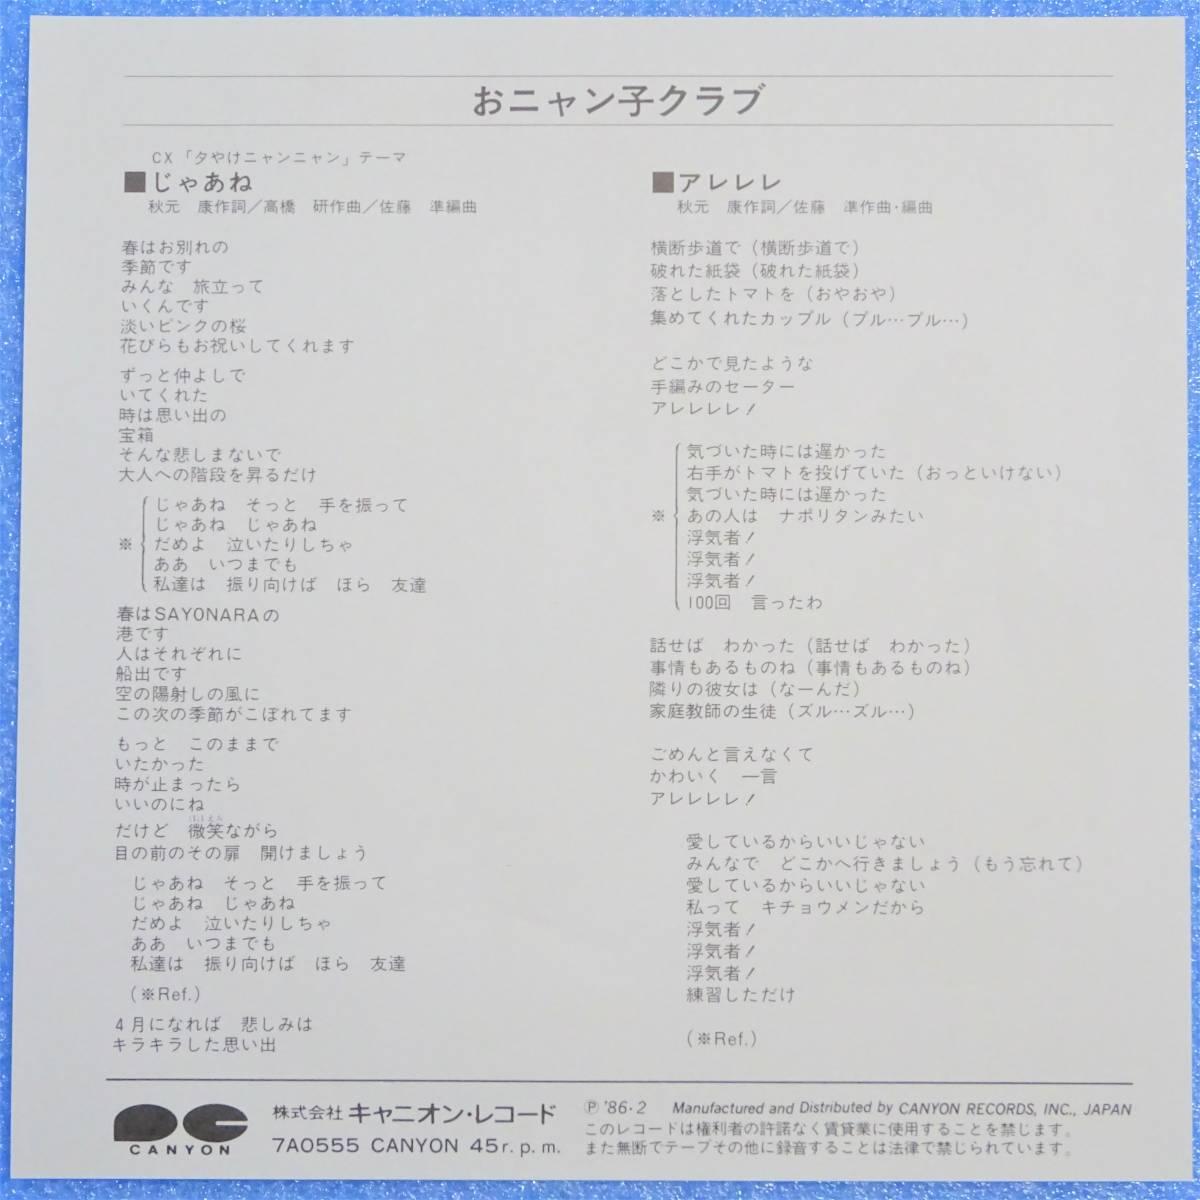 7' EP おニャン子クラブ / じゃあね 国内盤 1986年 ONYANKO CLUB 夕やけニャンニャン_画像2